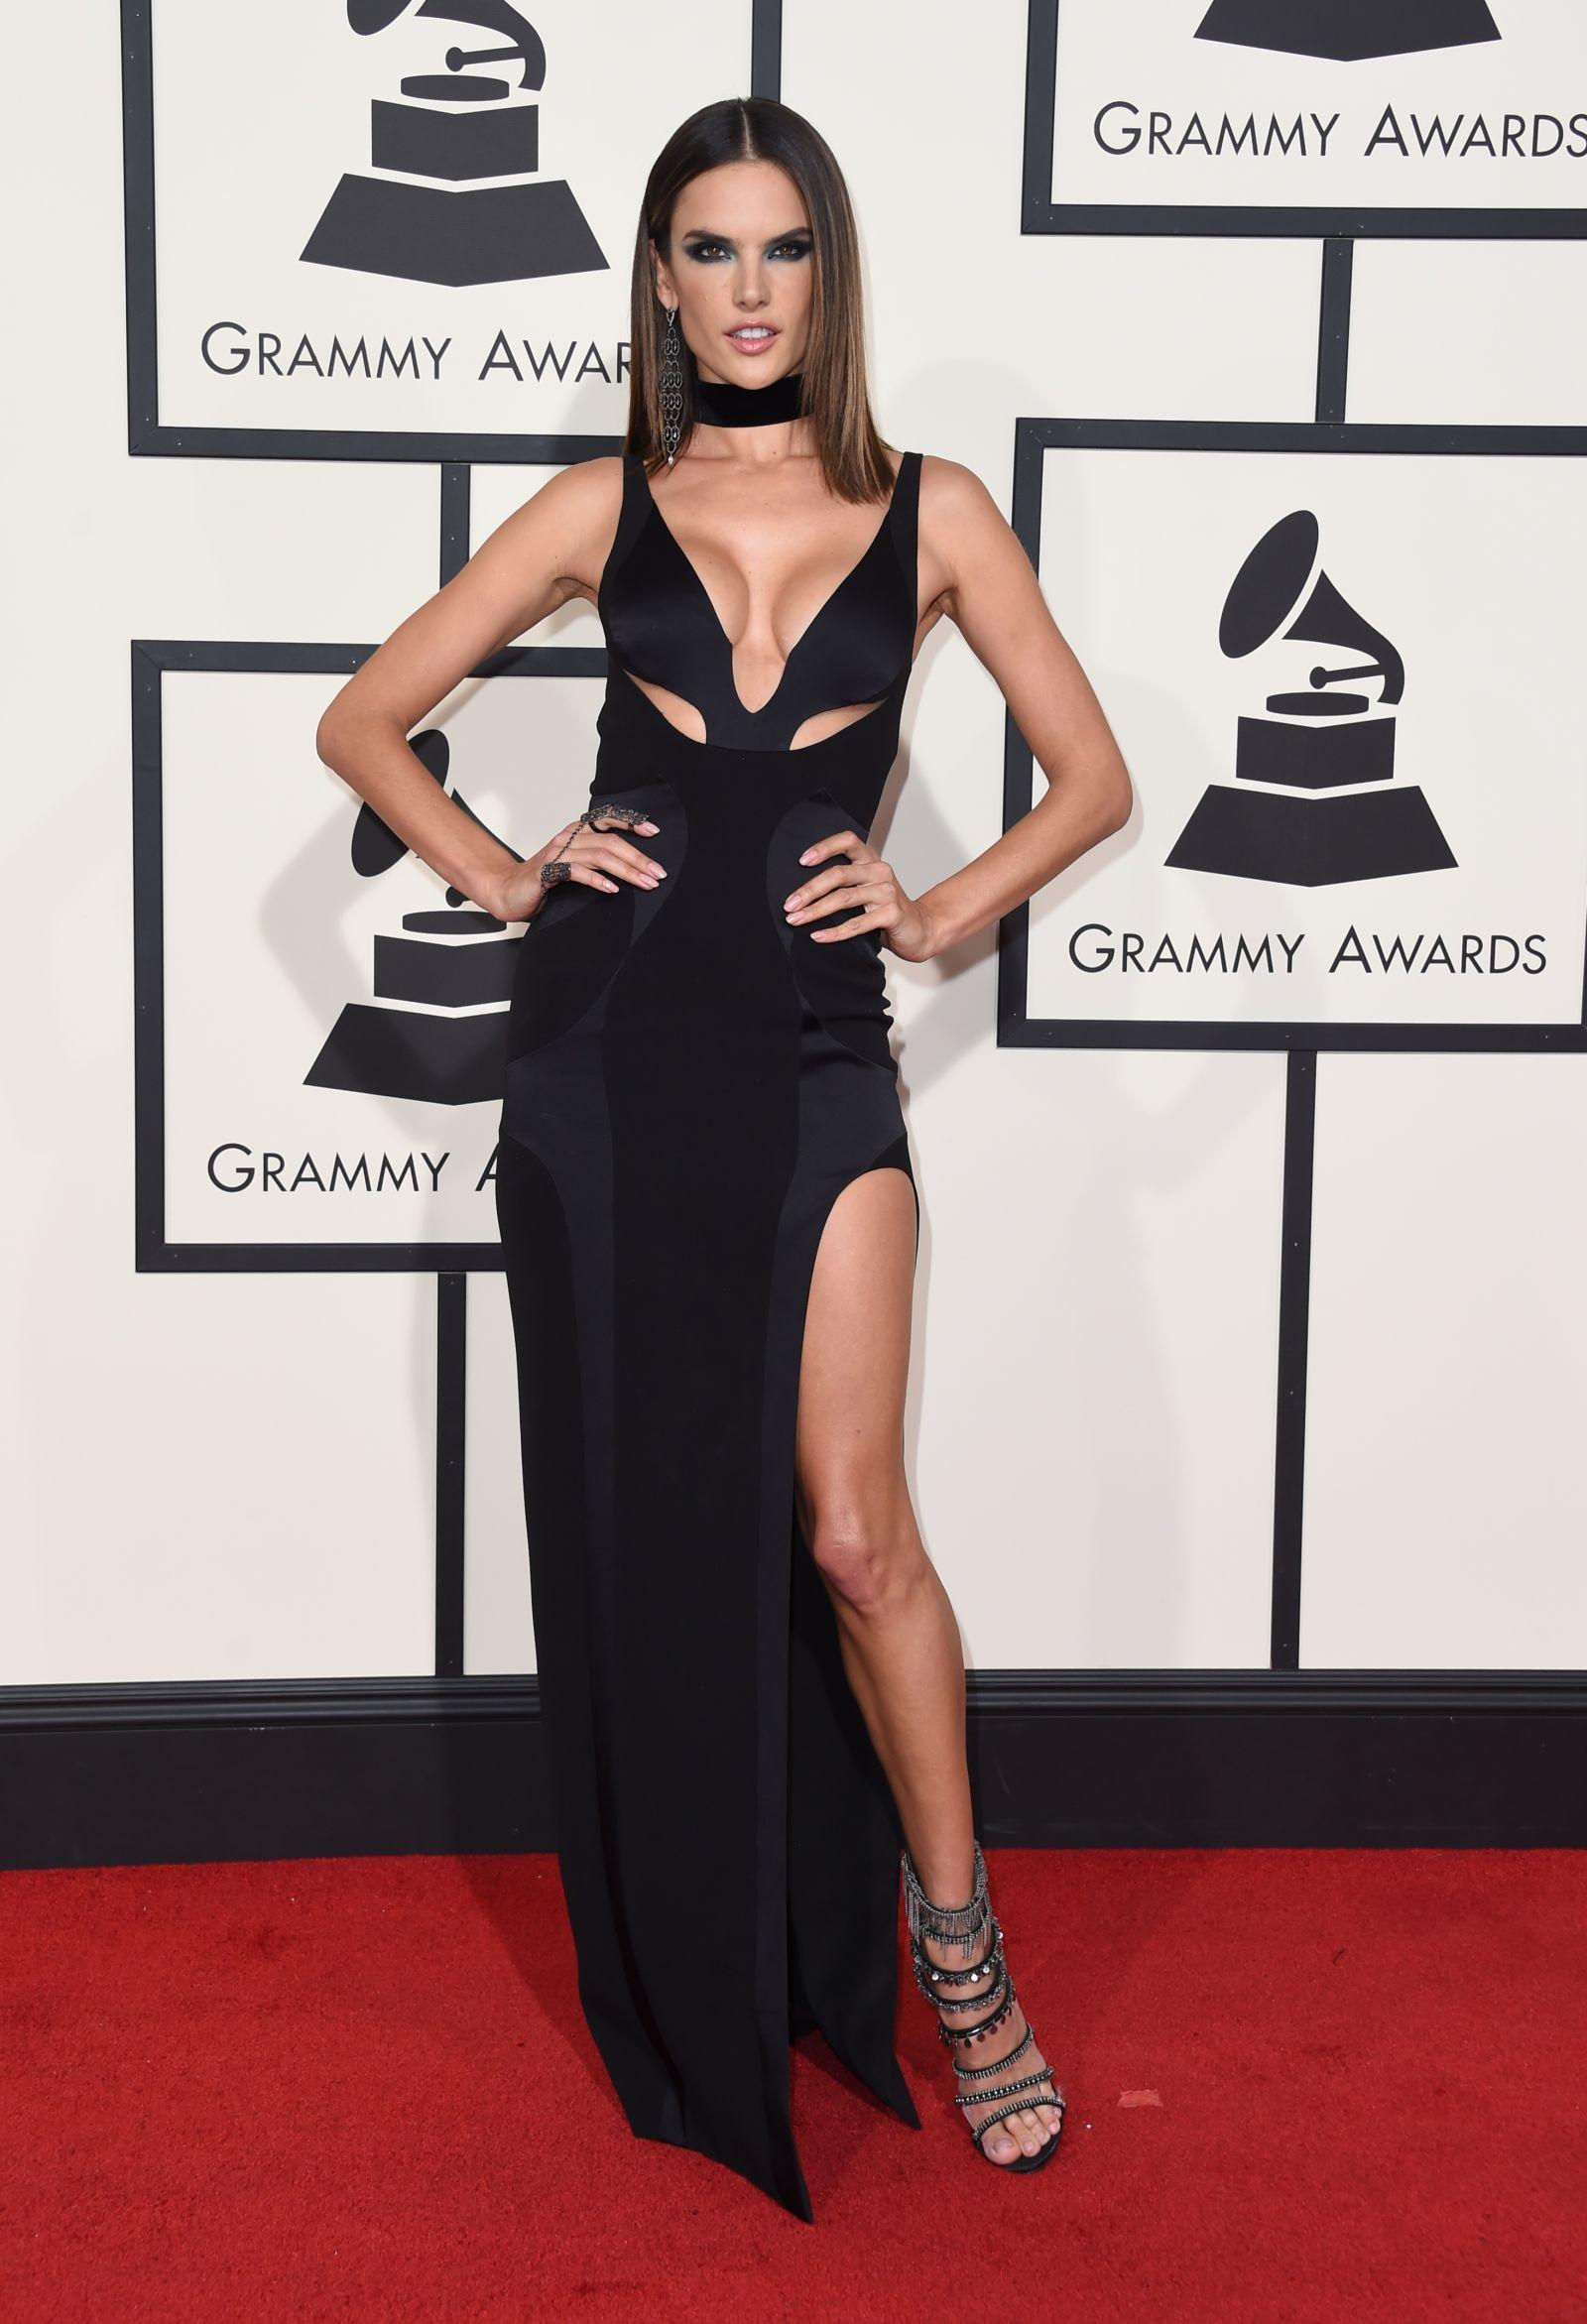 ALESSANDRA AMBROSIO celebrity hairstyles 2016 Grammys